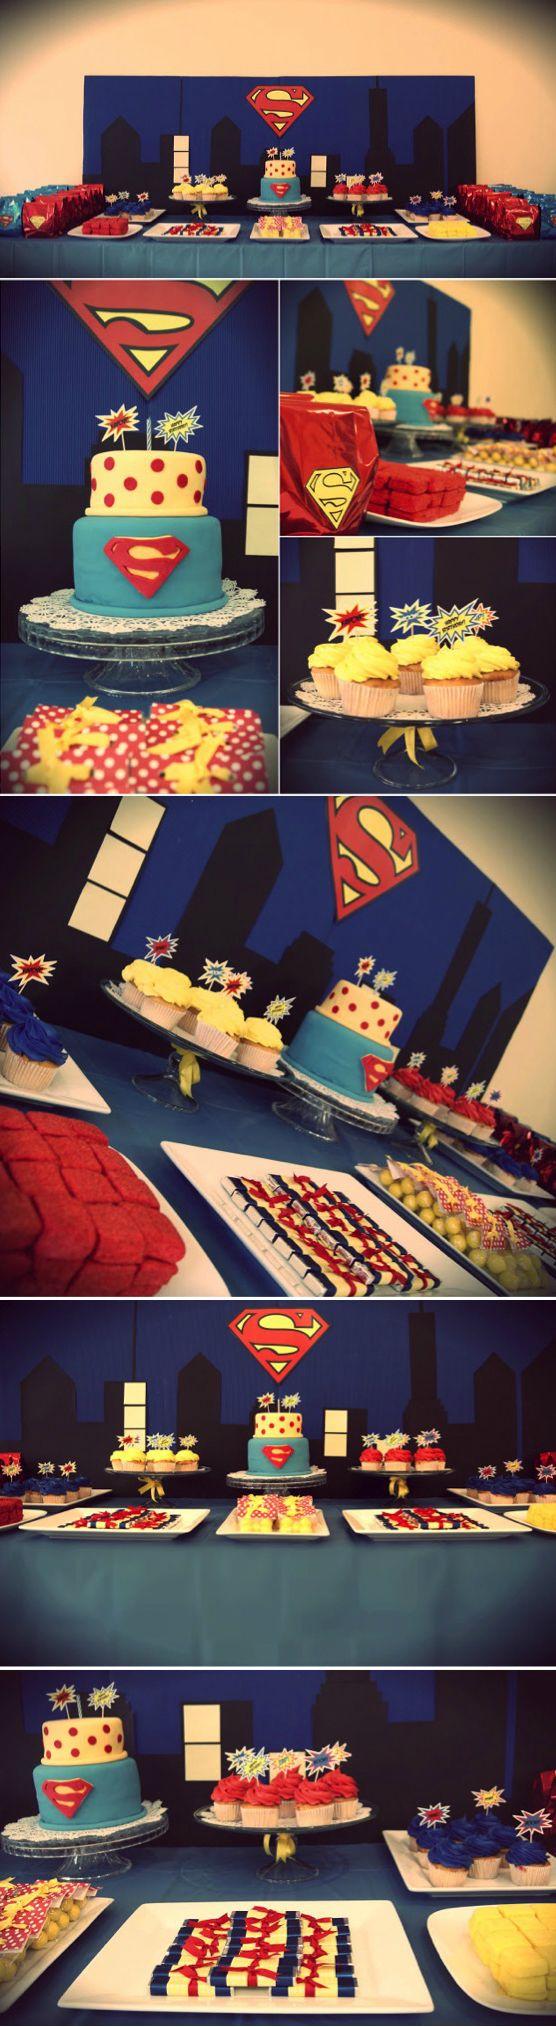 Best 25+ Superman party decorations ideas on Pinterest | Superman ...